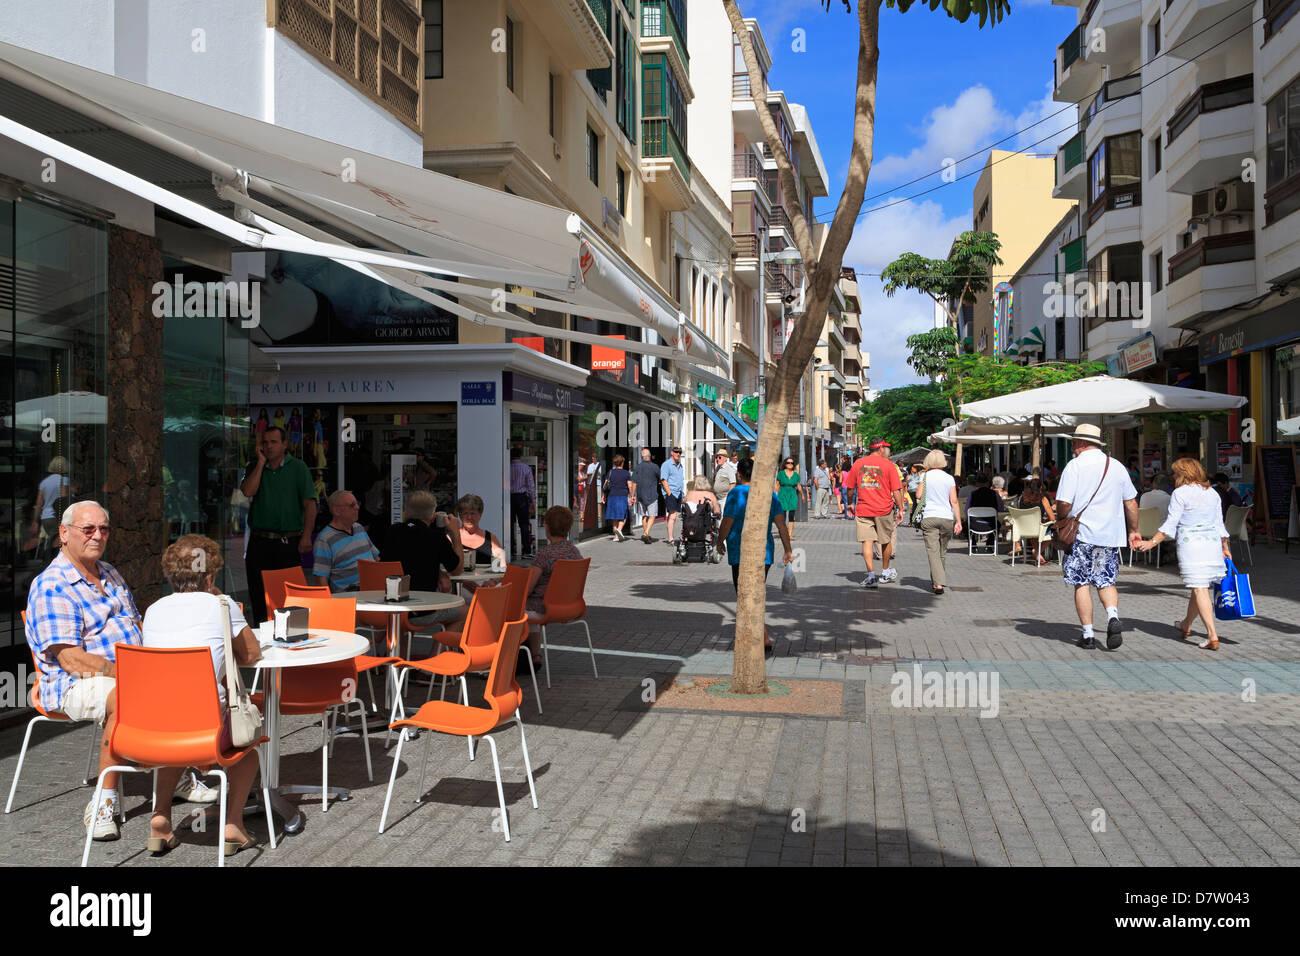 Cafe on Calle Leon Castillo, Arrecife, Lanzarote Island, Canary Islands, Spain - Stock Image